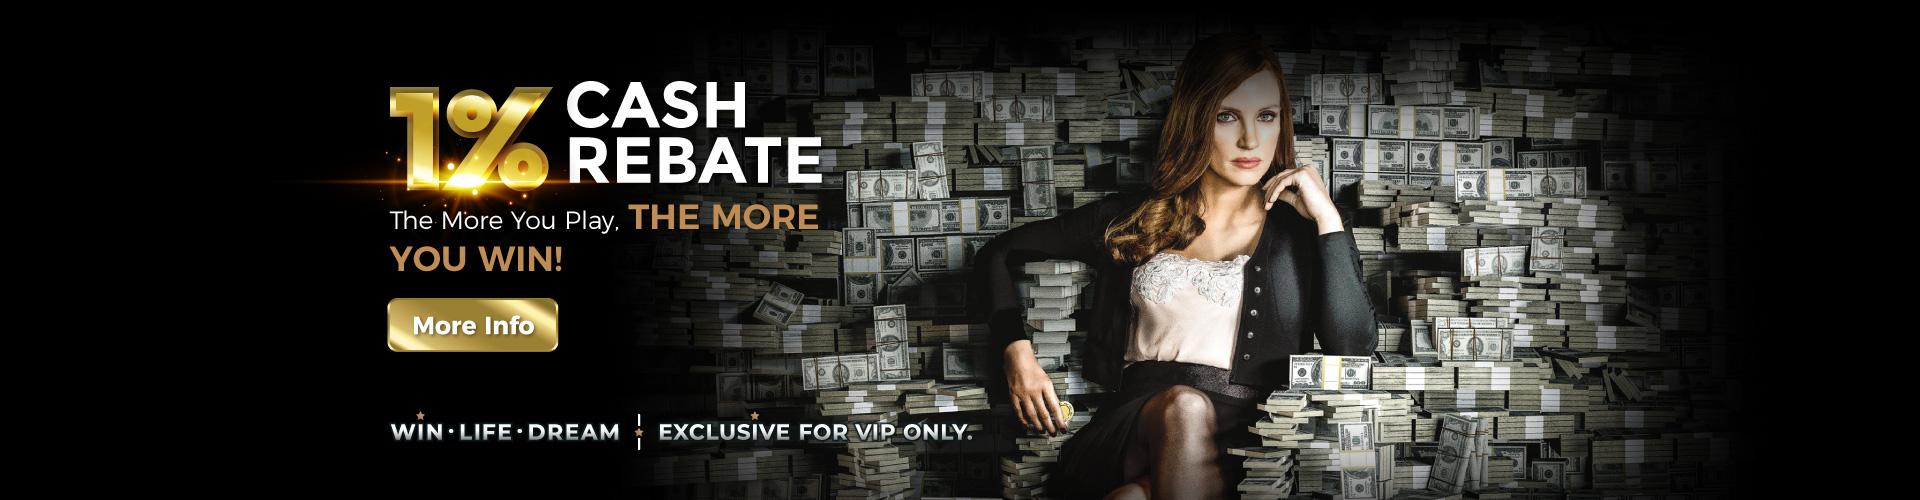 Cash Rebate rewards